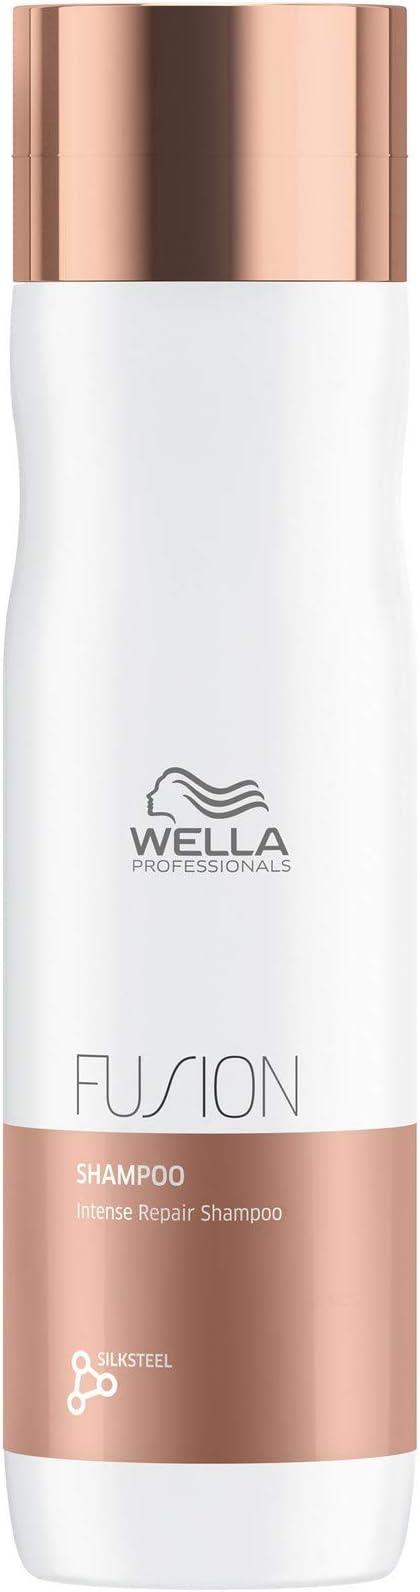 WELLA Fusion Intense Repair Shampoo, 250 ml multicoloured: Amazon.co.uk: Beauty